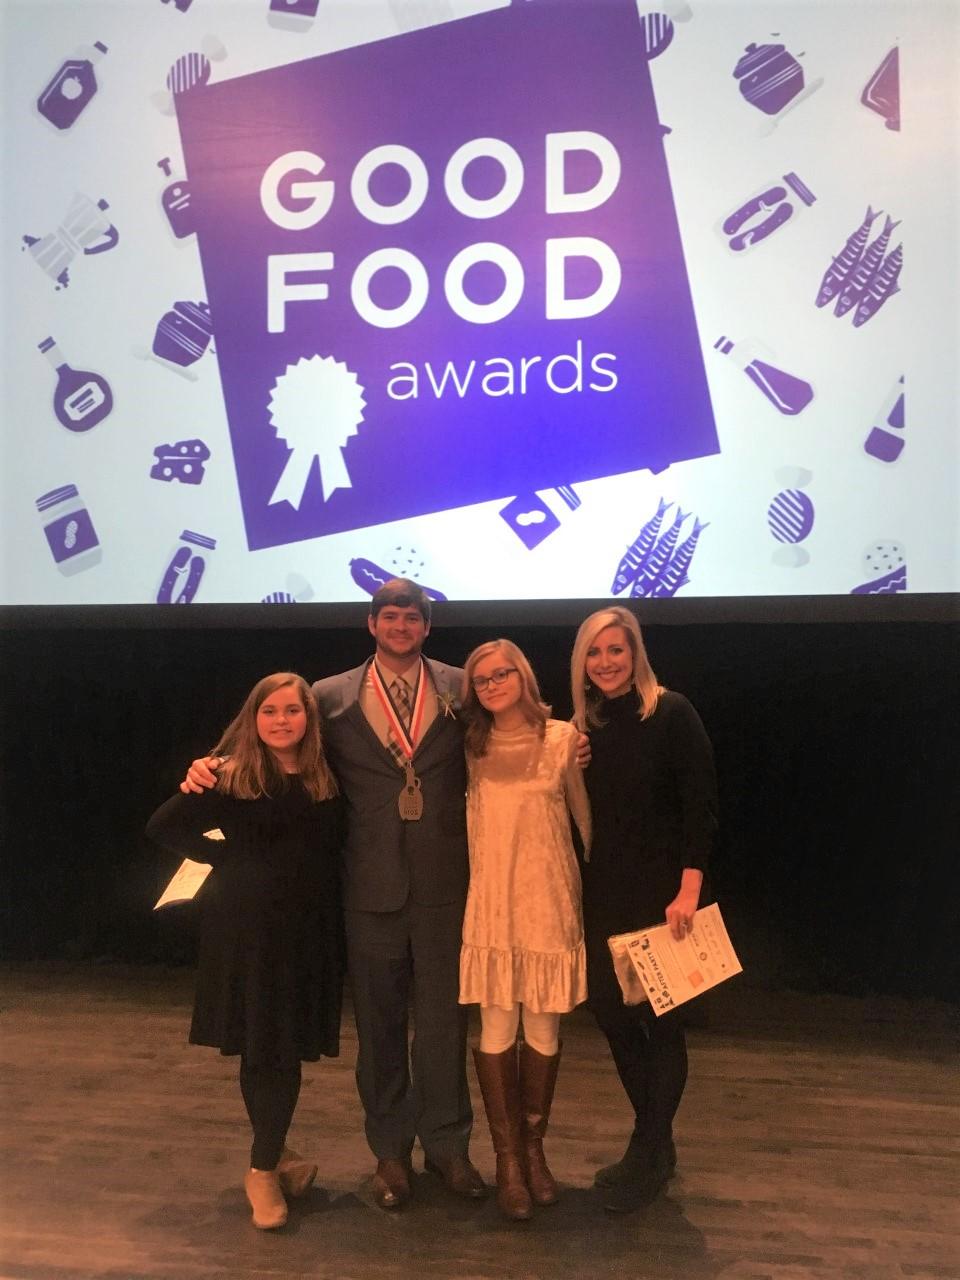 family pic good food 2018 (2).jpg